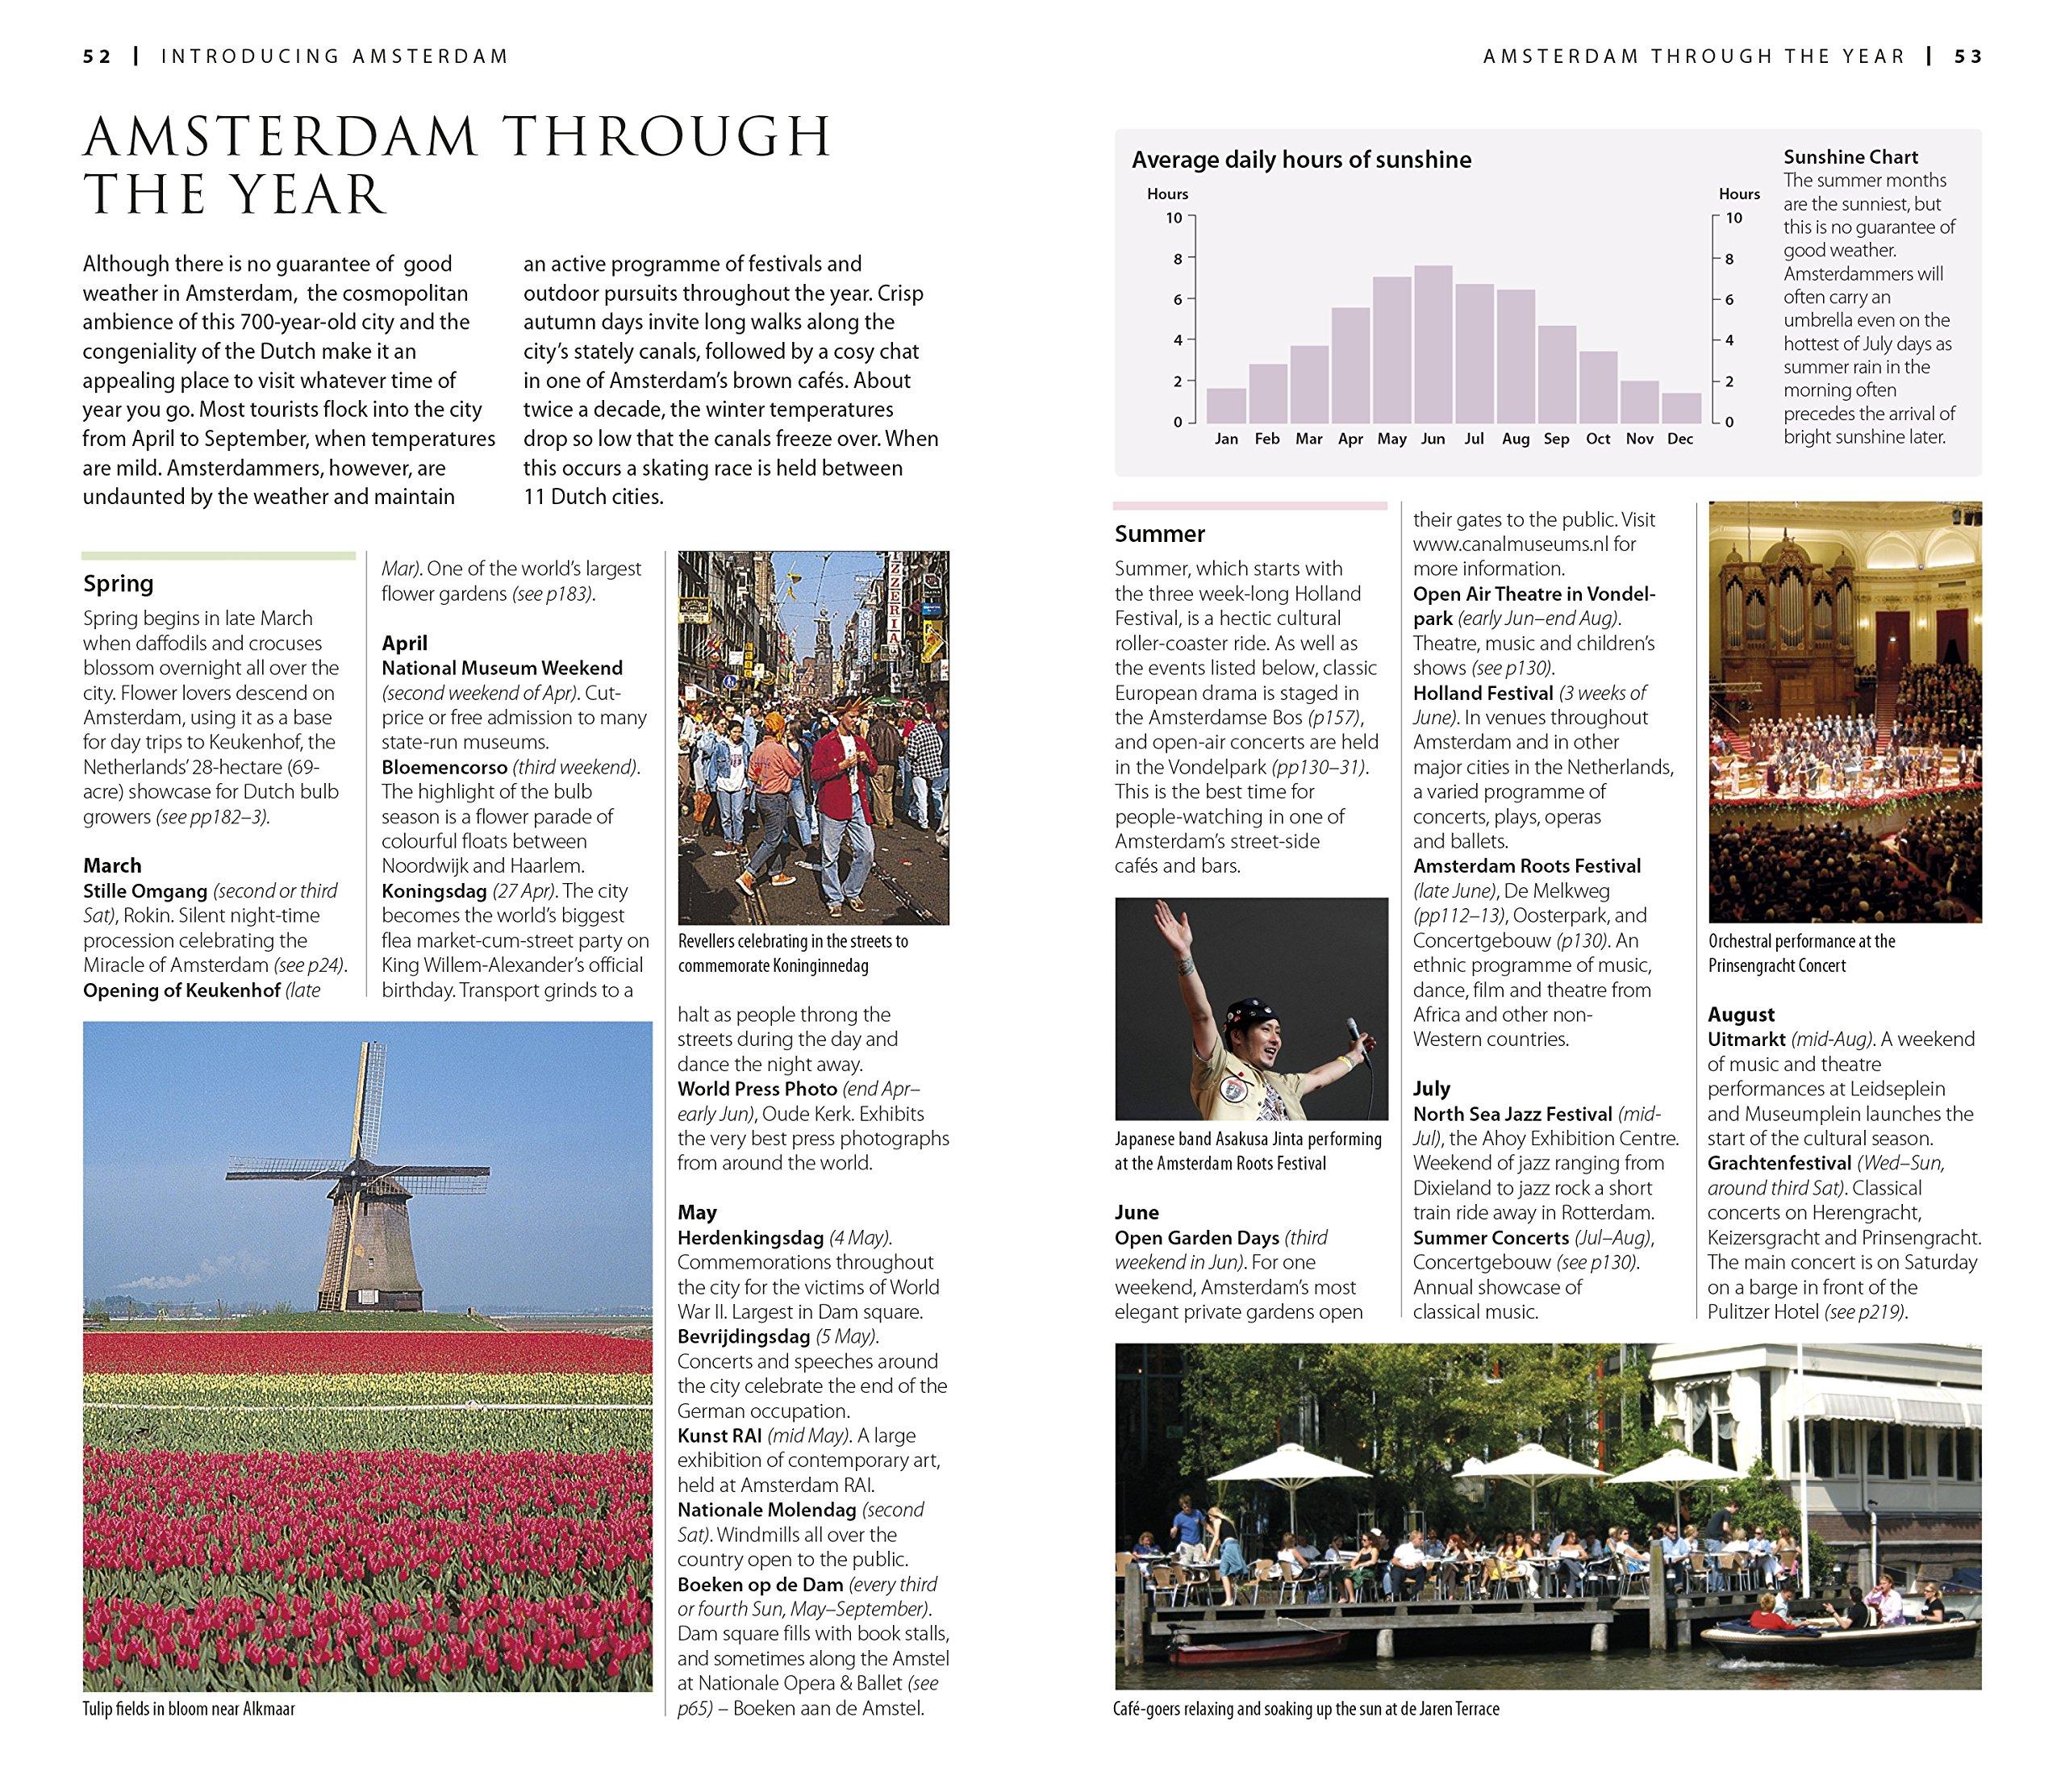 DK Eyewitness Travel Guide Amsterdam: DK Travel: 9781465439475: Amazon.com:  Books